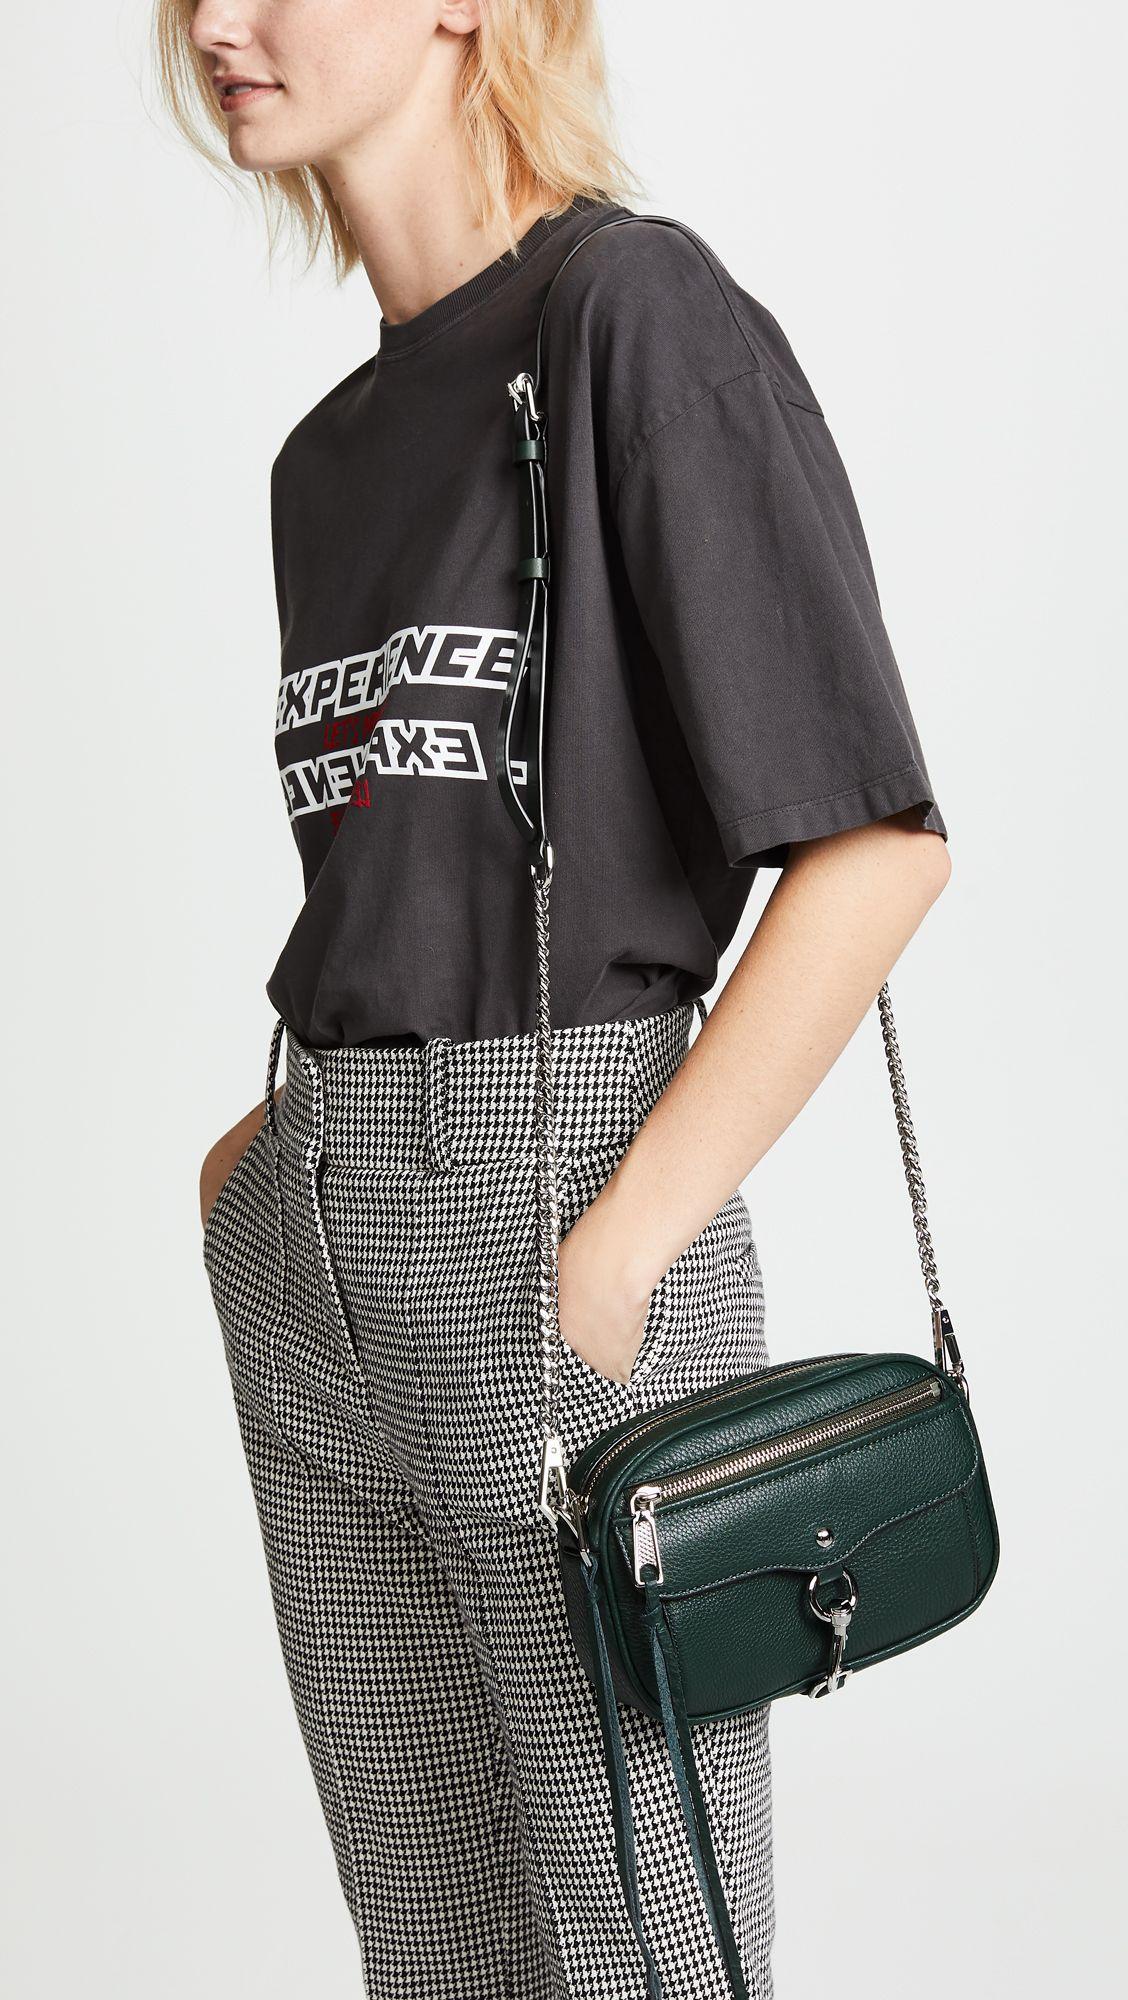 5f636e841aa382 Blythe Crossbody Bag | B A G S | Crossbody bag, Bags, Rebecca minkoff